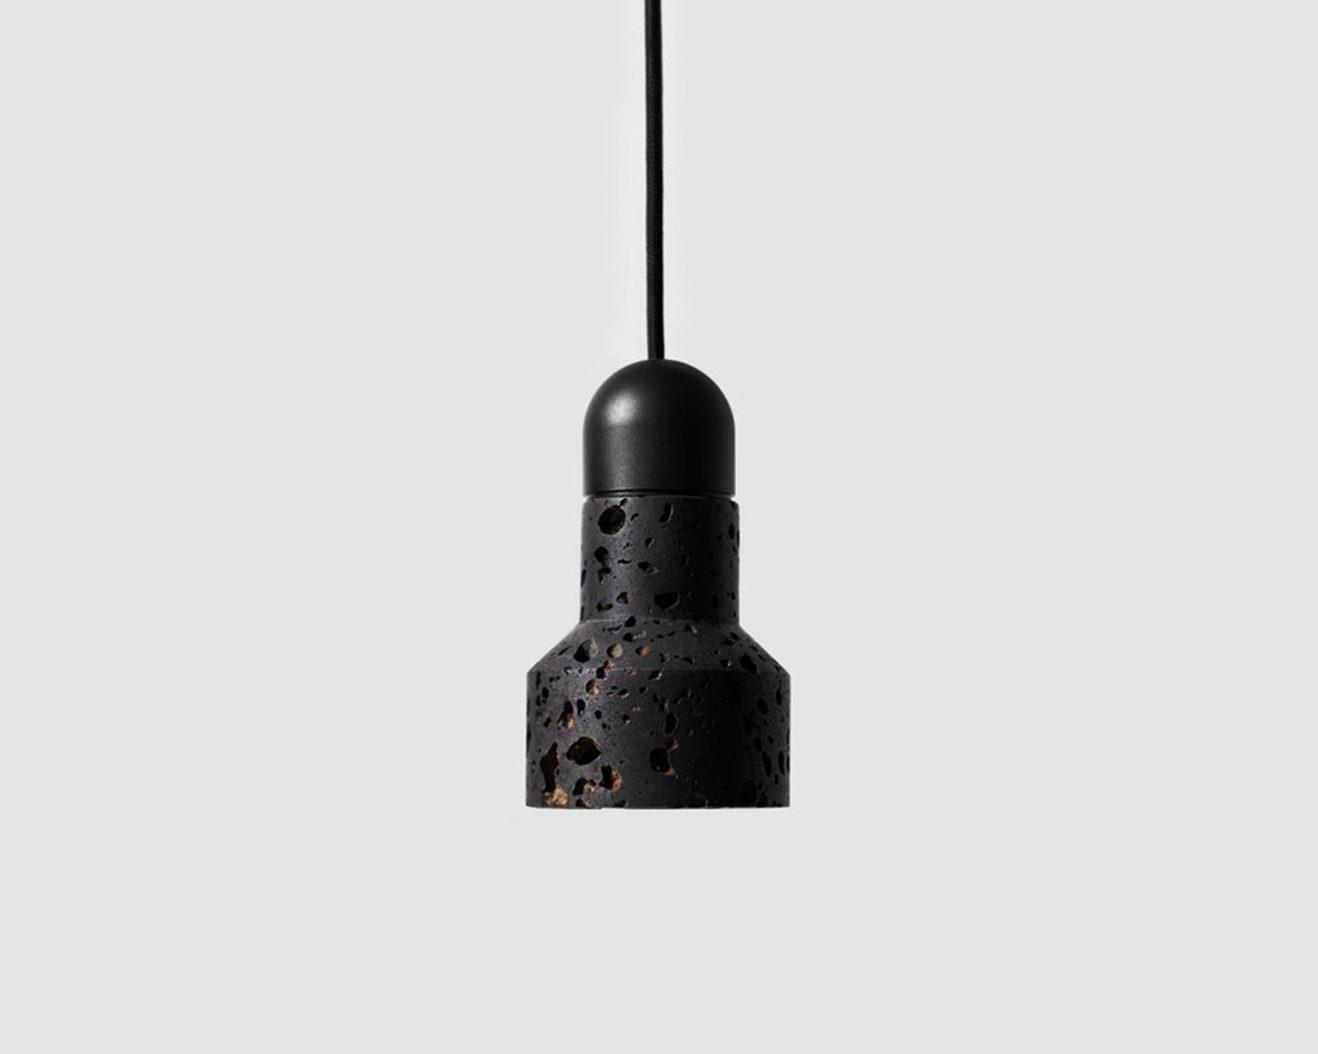 Buzao-Qie-Lava-Stone-Pendant-Lamp-Savannah-Bay-Gallery